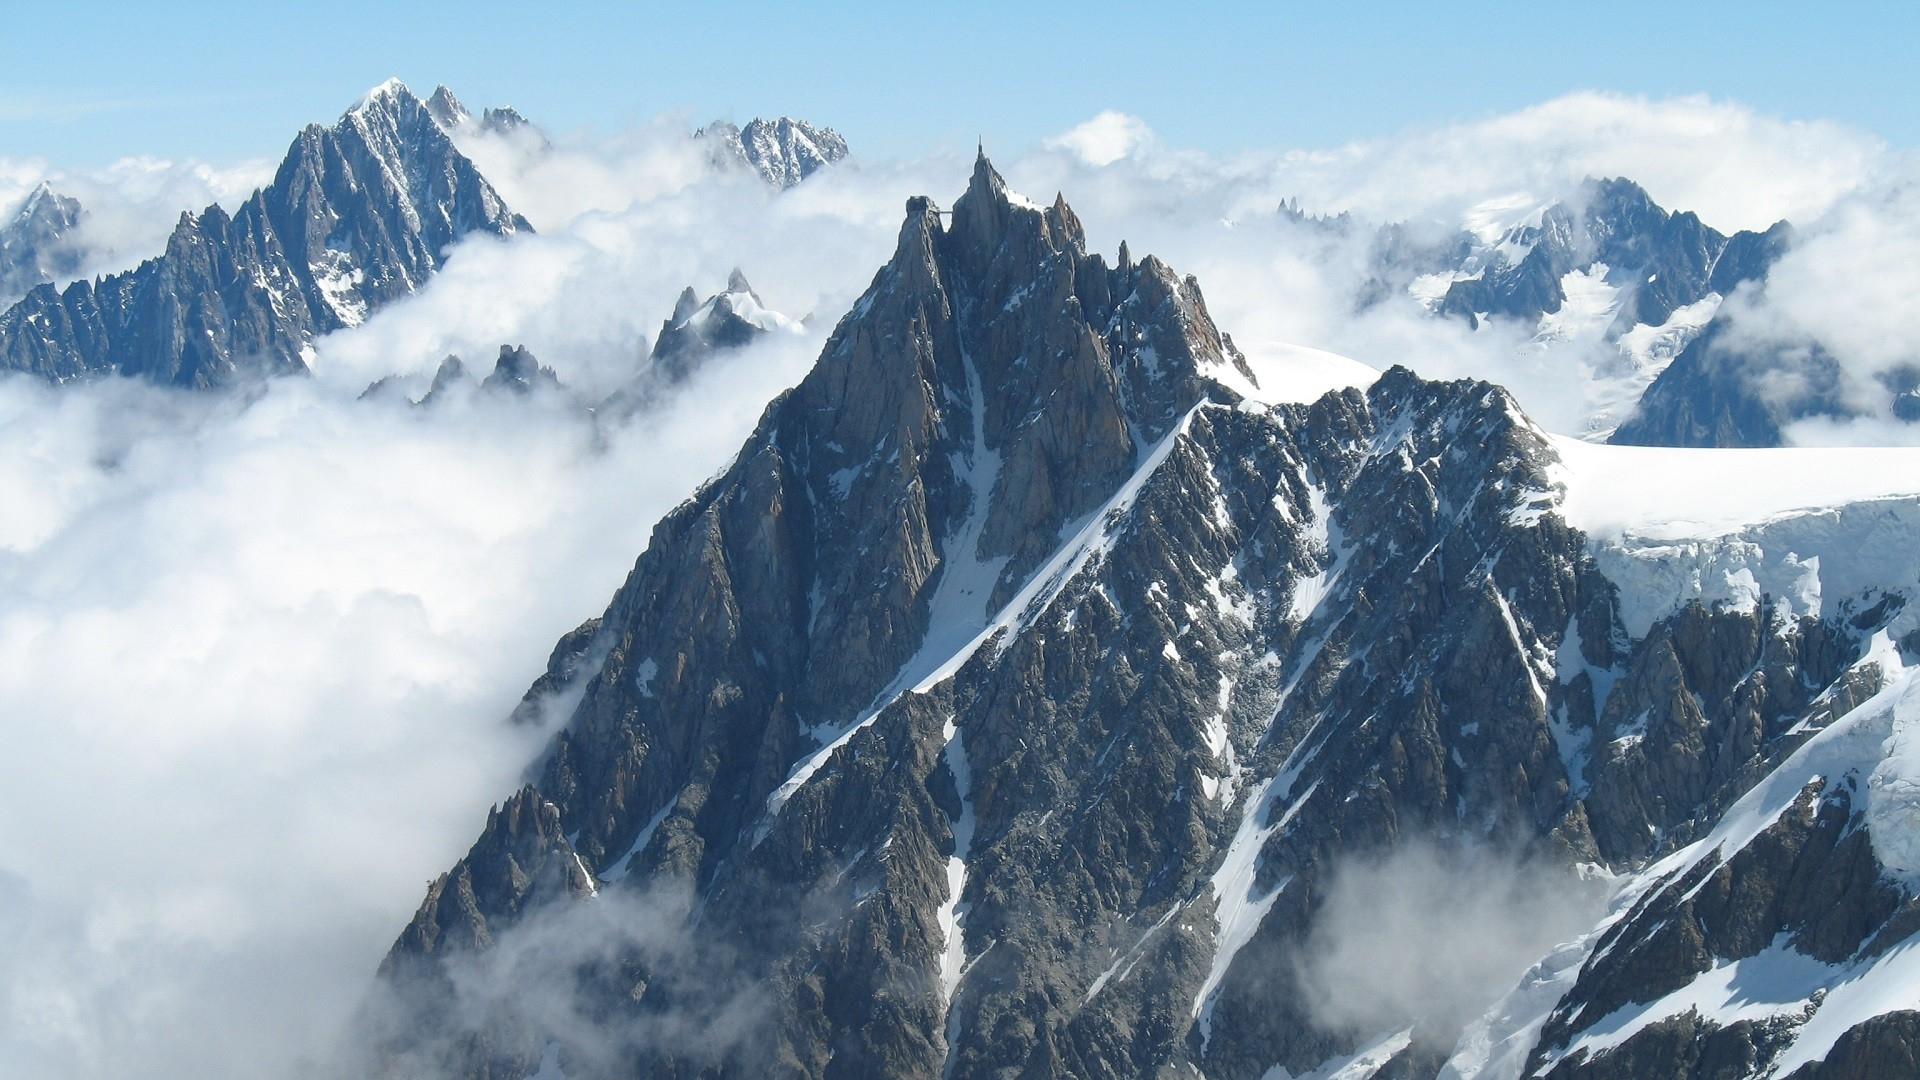 Popular Wallpaper Mountain Fog - mountains-sky-snow-winter-mountain-pass-Alps-summit-ridge-fog-peaks-mountain-weather-Massif-adventure-mountainous-landforms-landform-geographical-feature-geological-phenomenon-mountain-range-mountaineering-cirque-607505  2018_45895.jpg